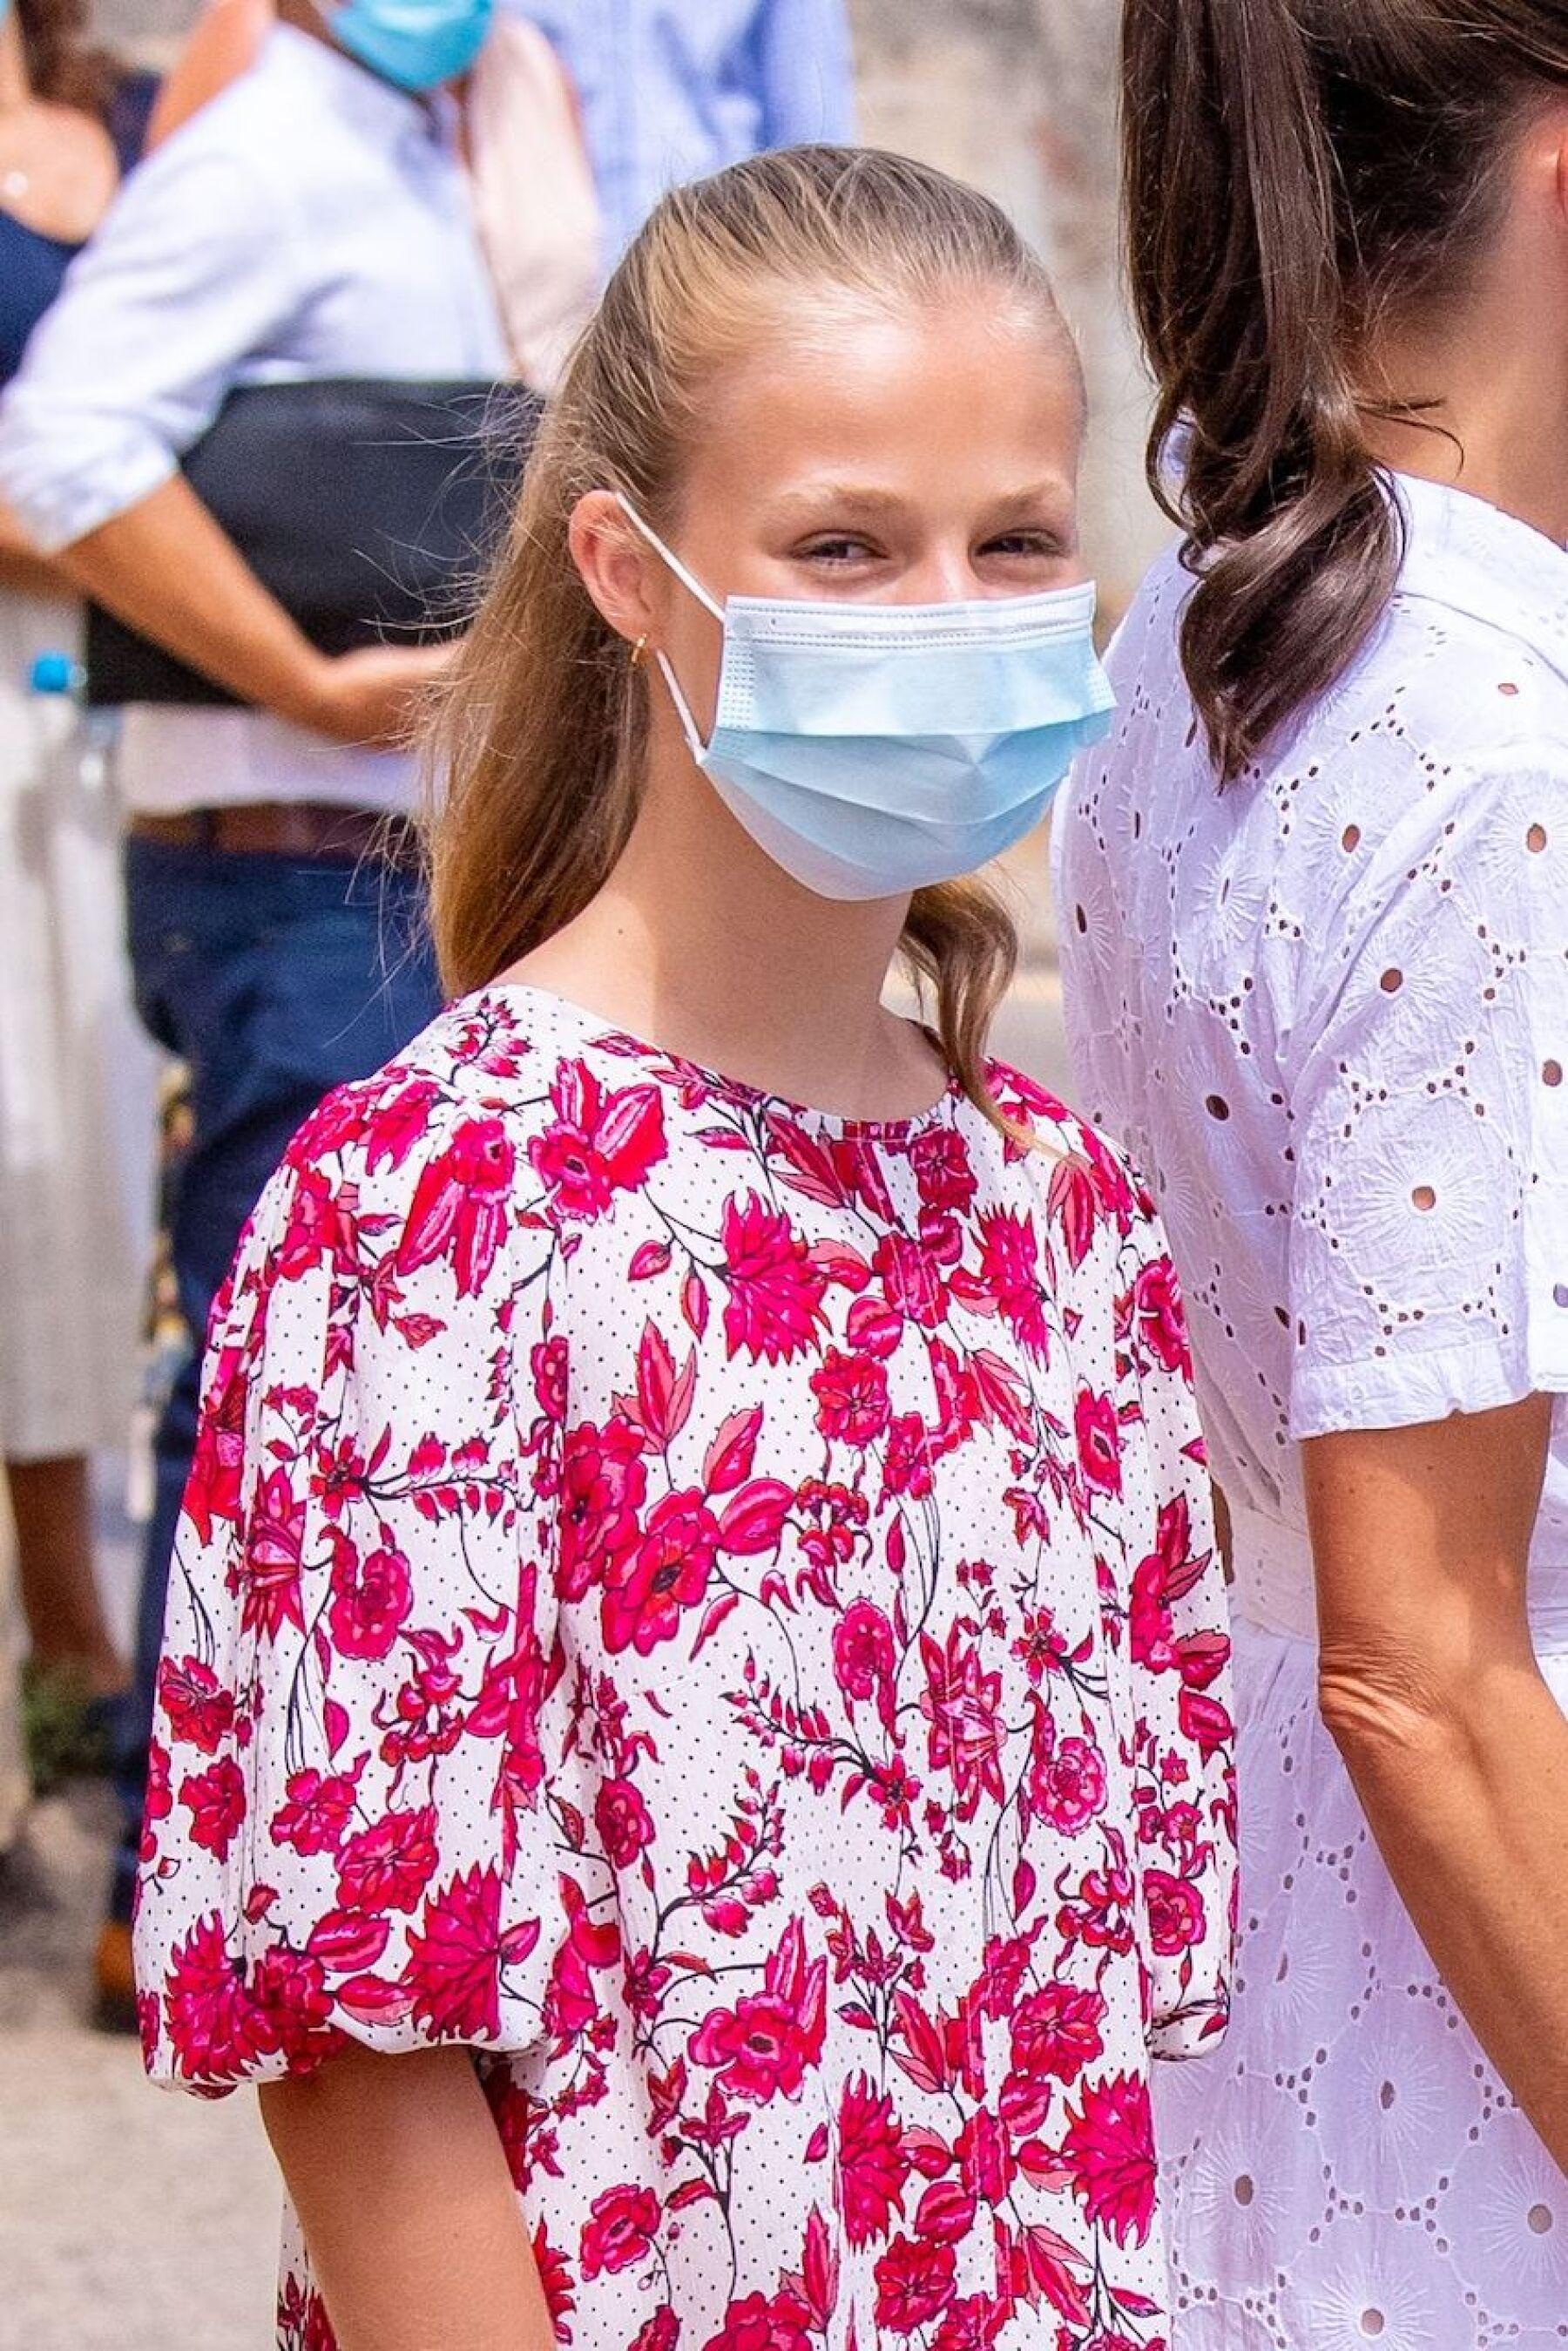 Spanish Royals visit to Naum Socio-educational Center, Palma, Balearic Islands, Spain - 11 Aug 2020